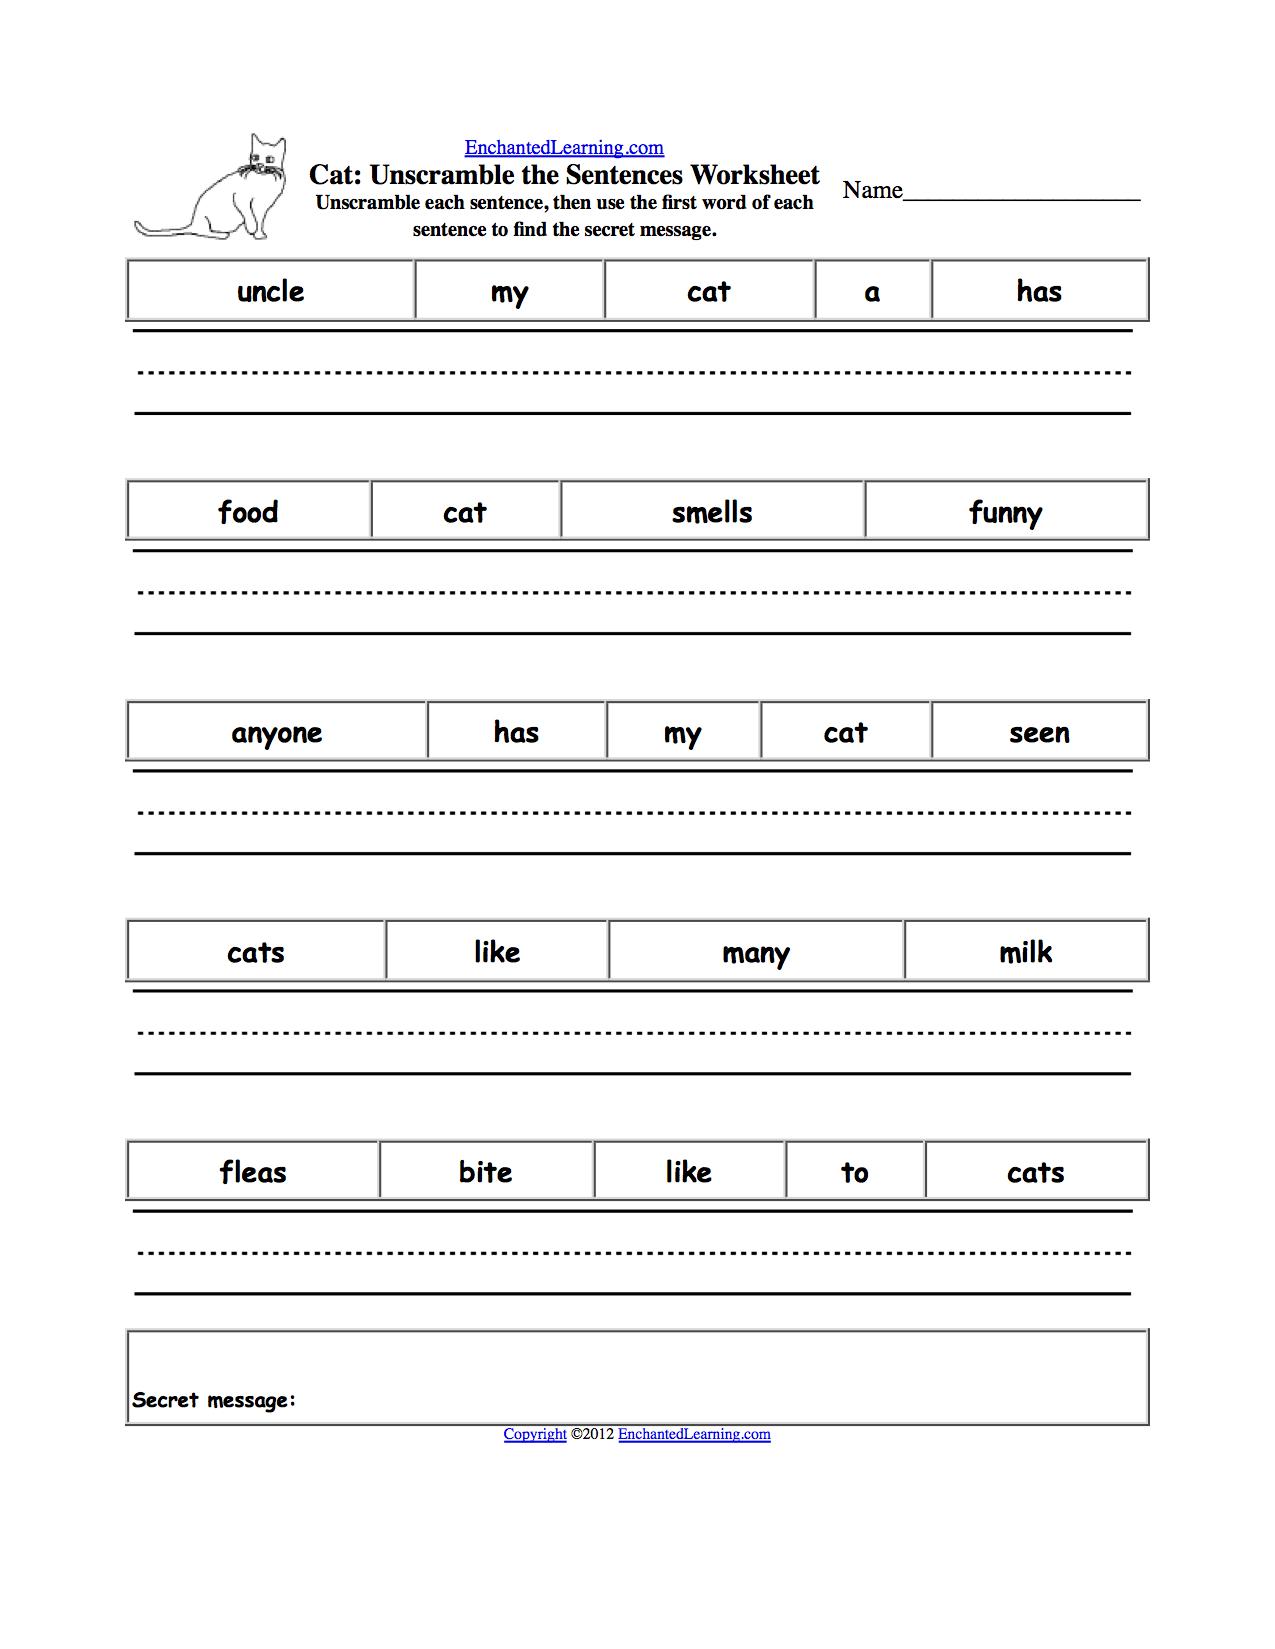 Unscramble The Sentences Worksheets - Enchantedlearning - Free Printable Scrambled Sentences Worksheets